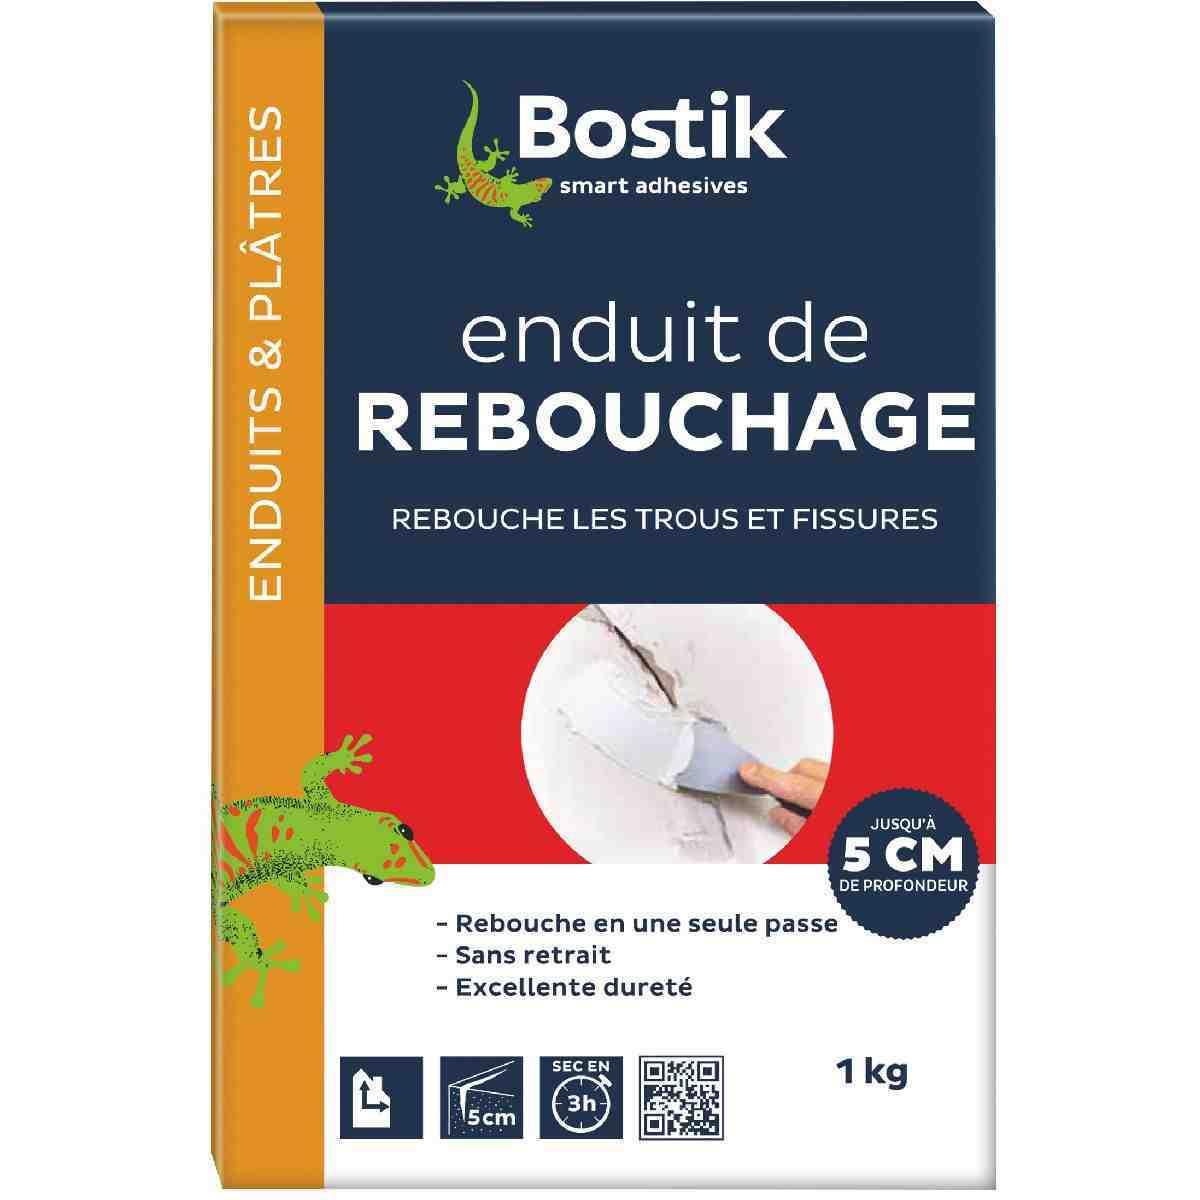 Enduit poudre de rebouchage bostik bo te 1 kg de enduit poudre de rebouchage - Enduit de rebouchage platre ...